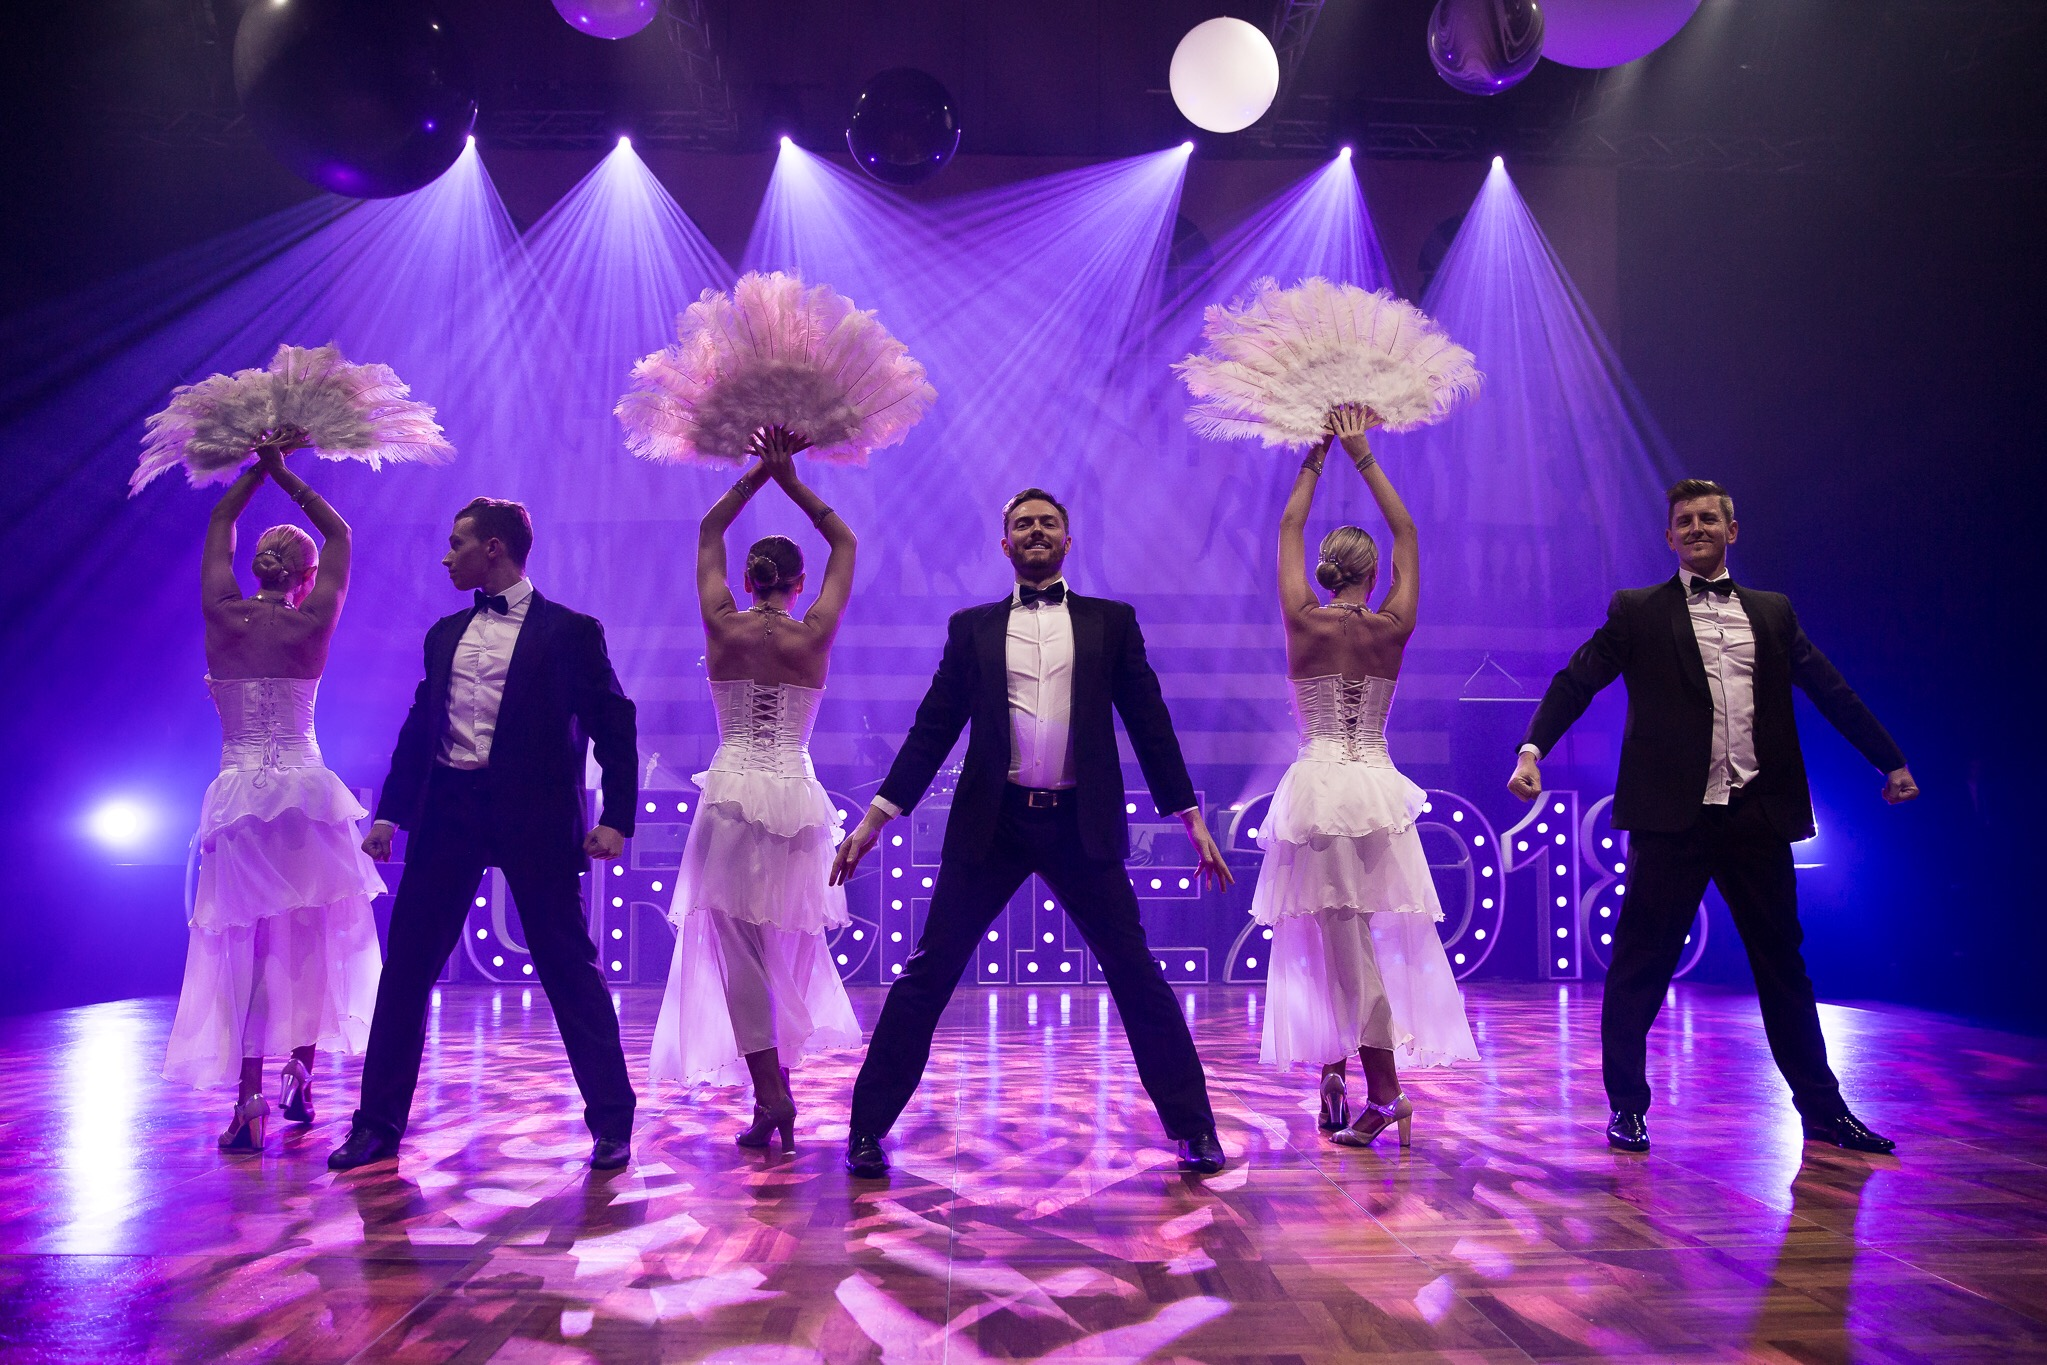 Dancers for Corporate events Gold Coast Australia